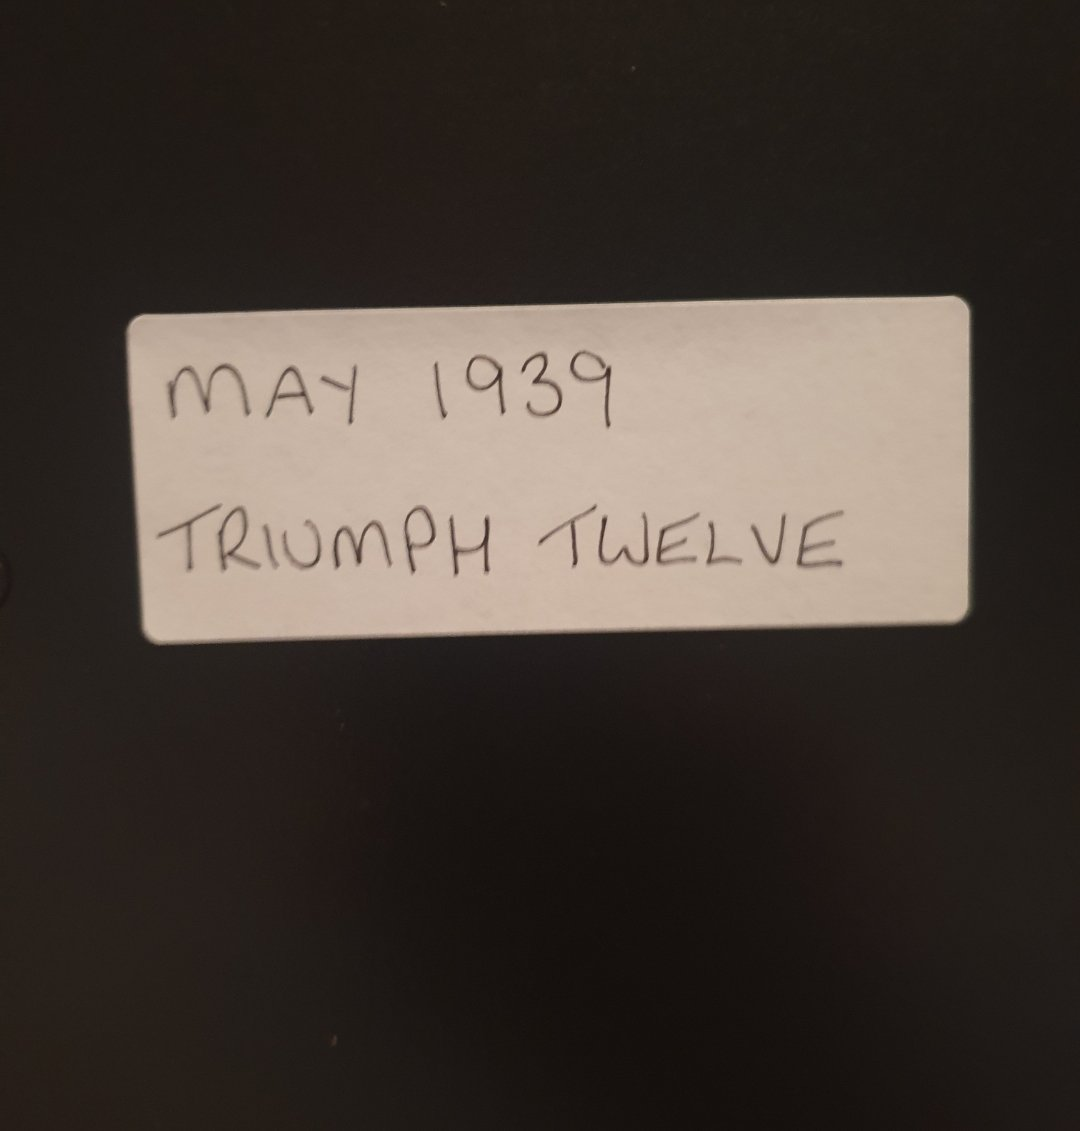 1984 Original 1939 Triumph Twelve Framed Advert  For Sale (picture 2 of 3)